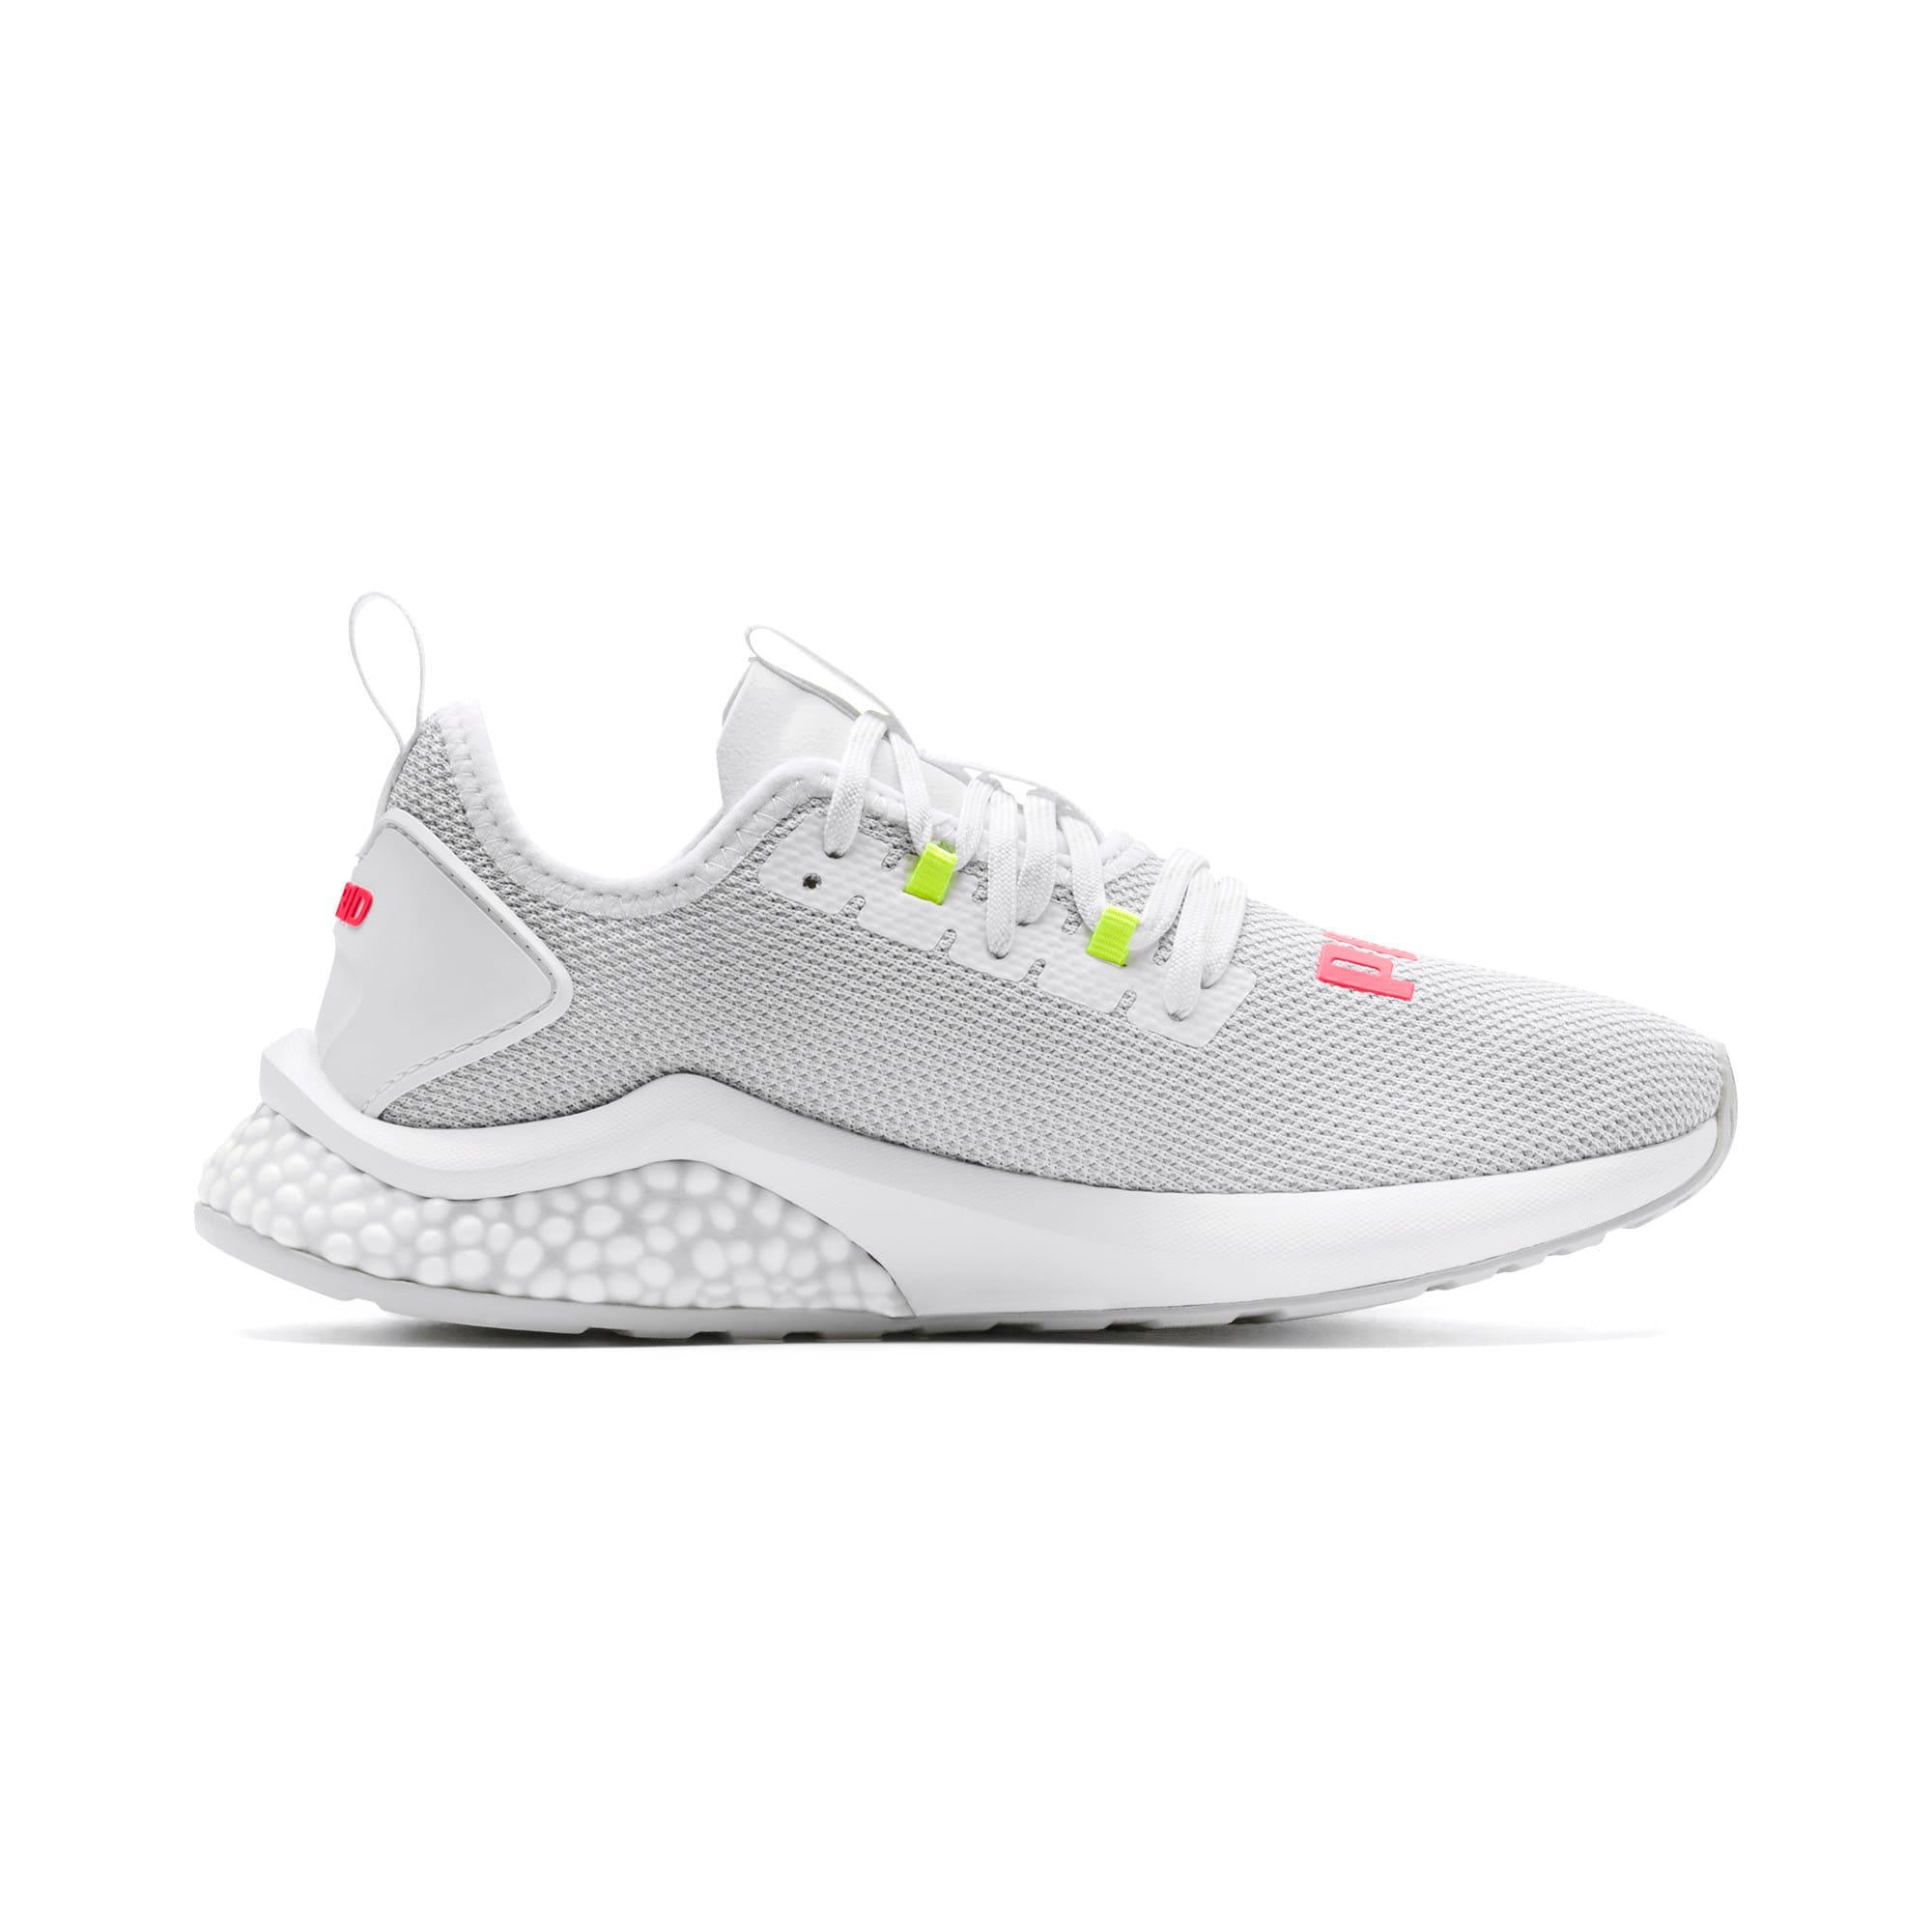 Thumbnail 6 of HYBRID NX Women's Running Shoes, Puma White-Pink Alert, medium